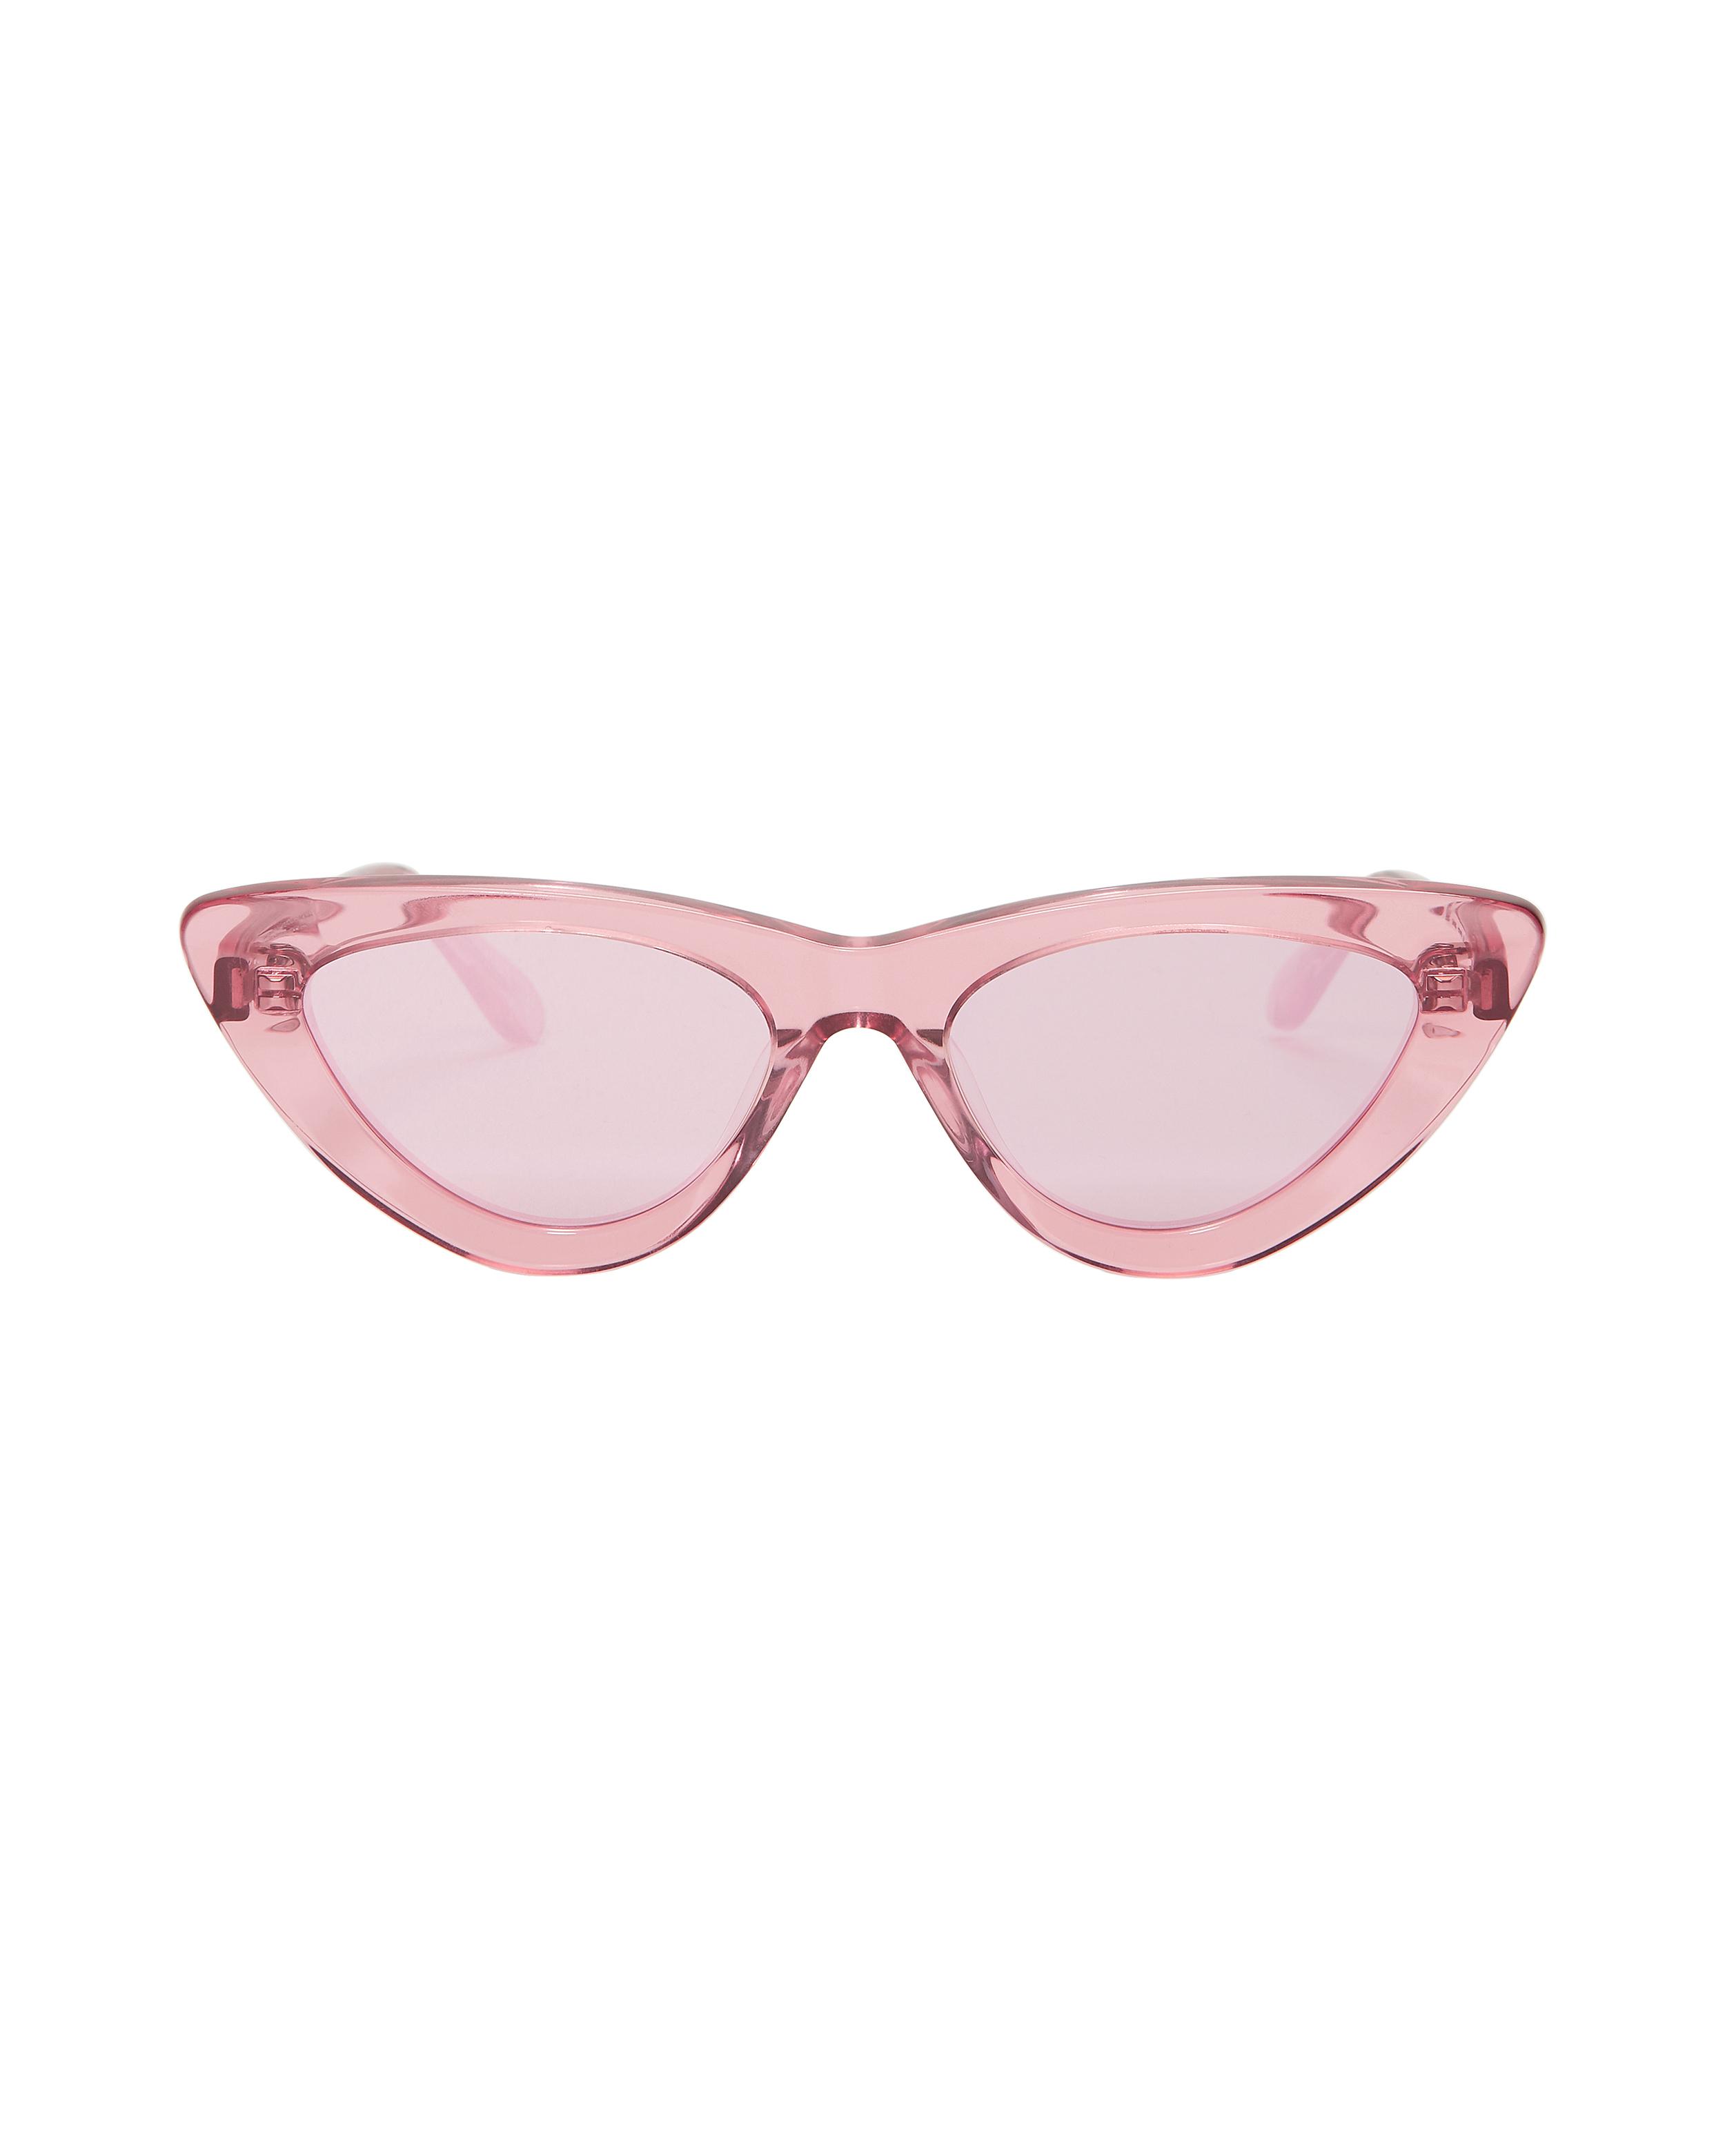 CHIMI EYEWEAR Pink Cat Eye Sunglasses